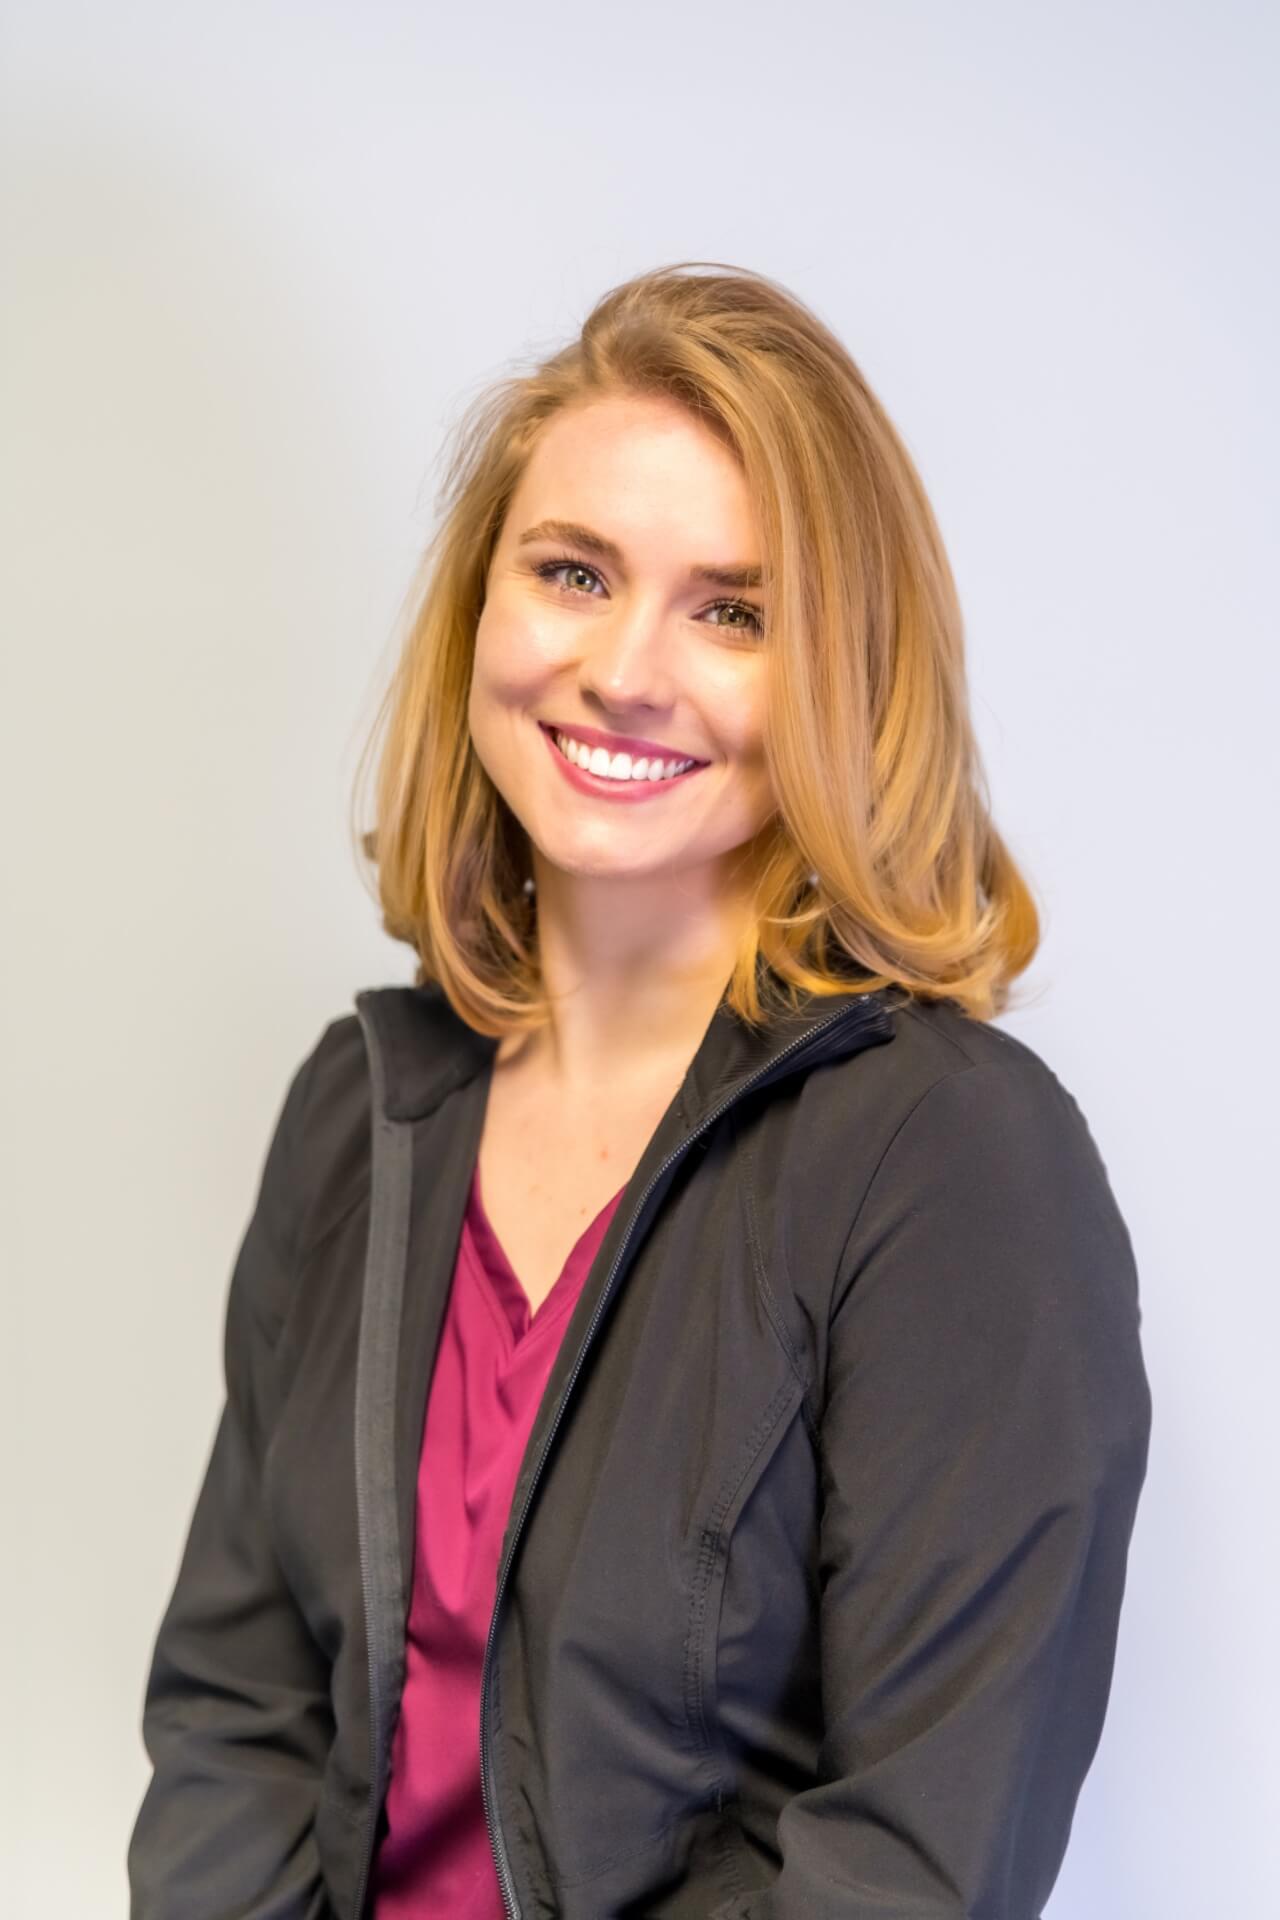 Jordan cares for patients as a dental hygienist